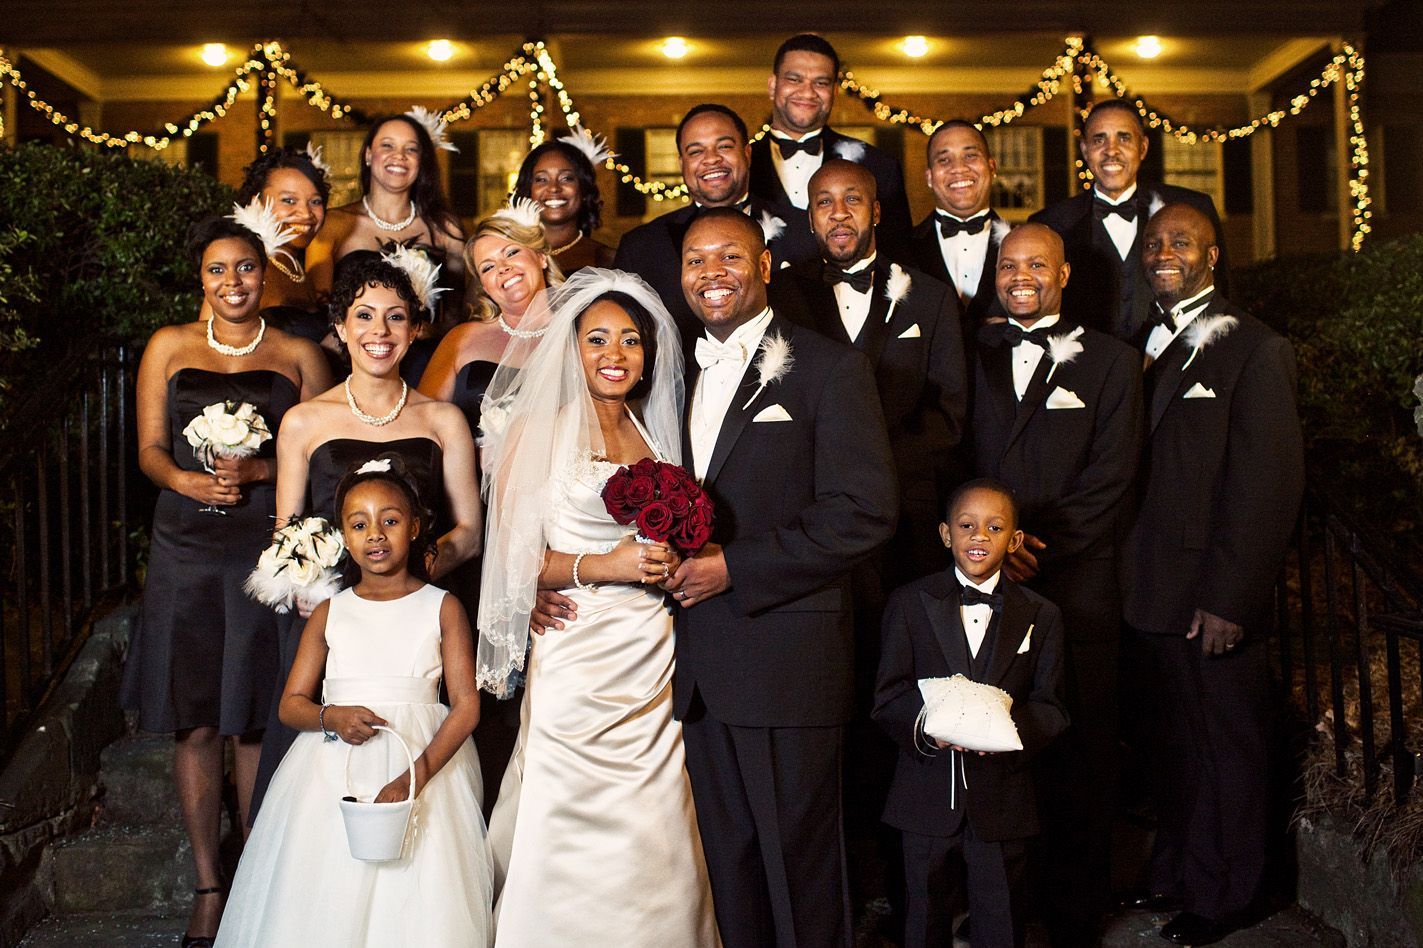 Harlem Renaissance Themed Wedding Google Search Renaissance Wedding Vintage Wedding Bridesmaid Dresses